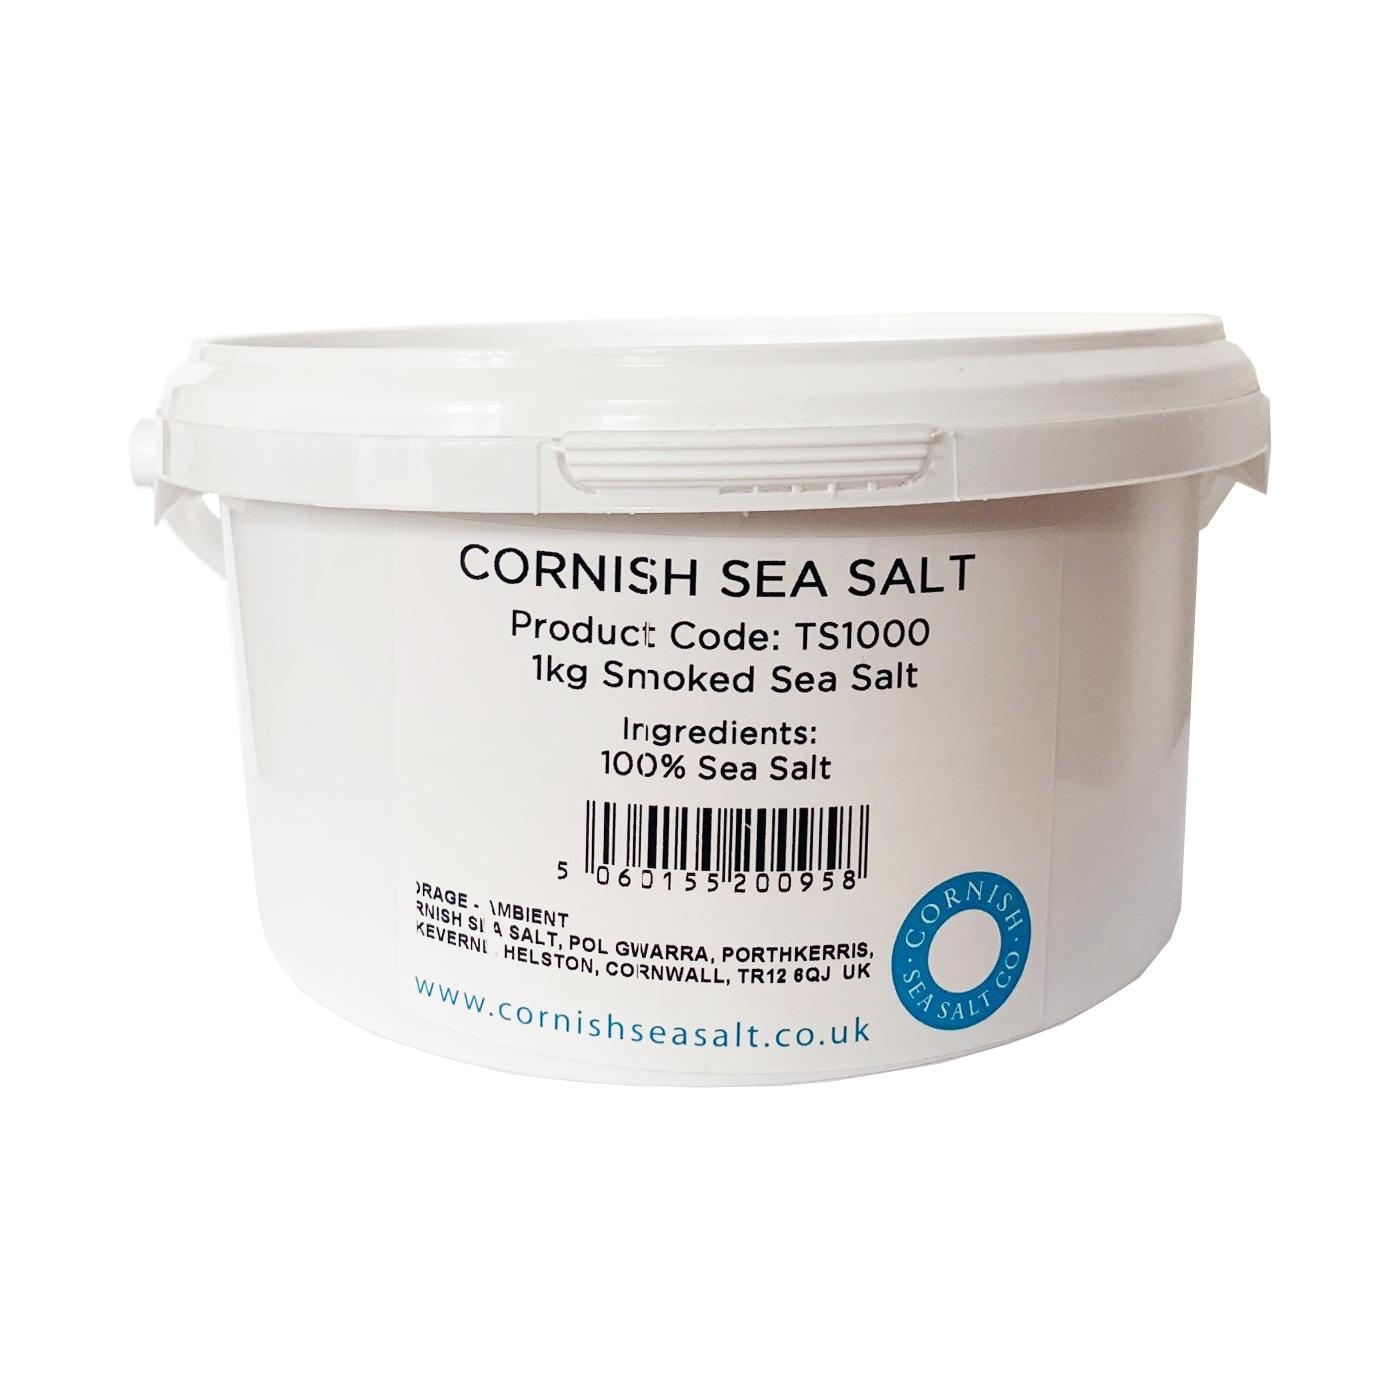 Cornish Sea Salt Smoked 1000g